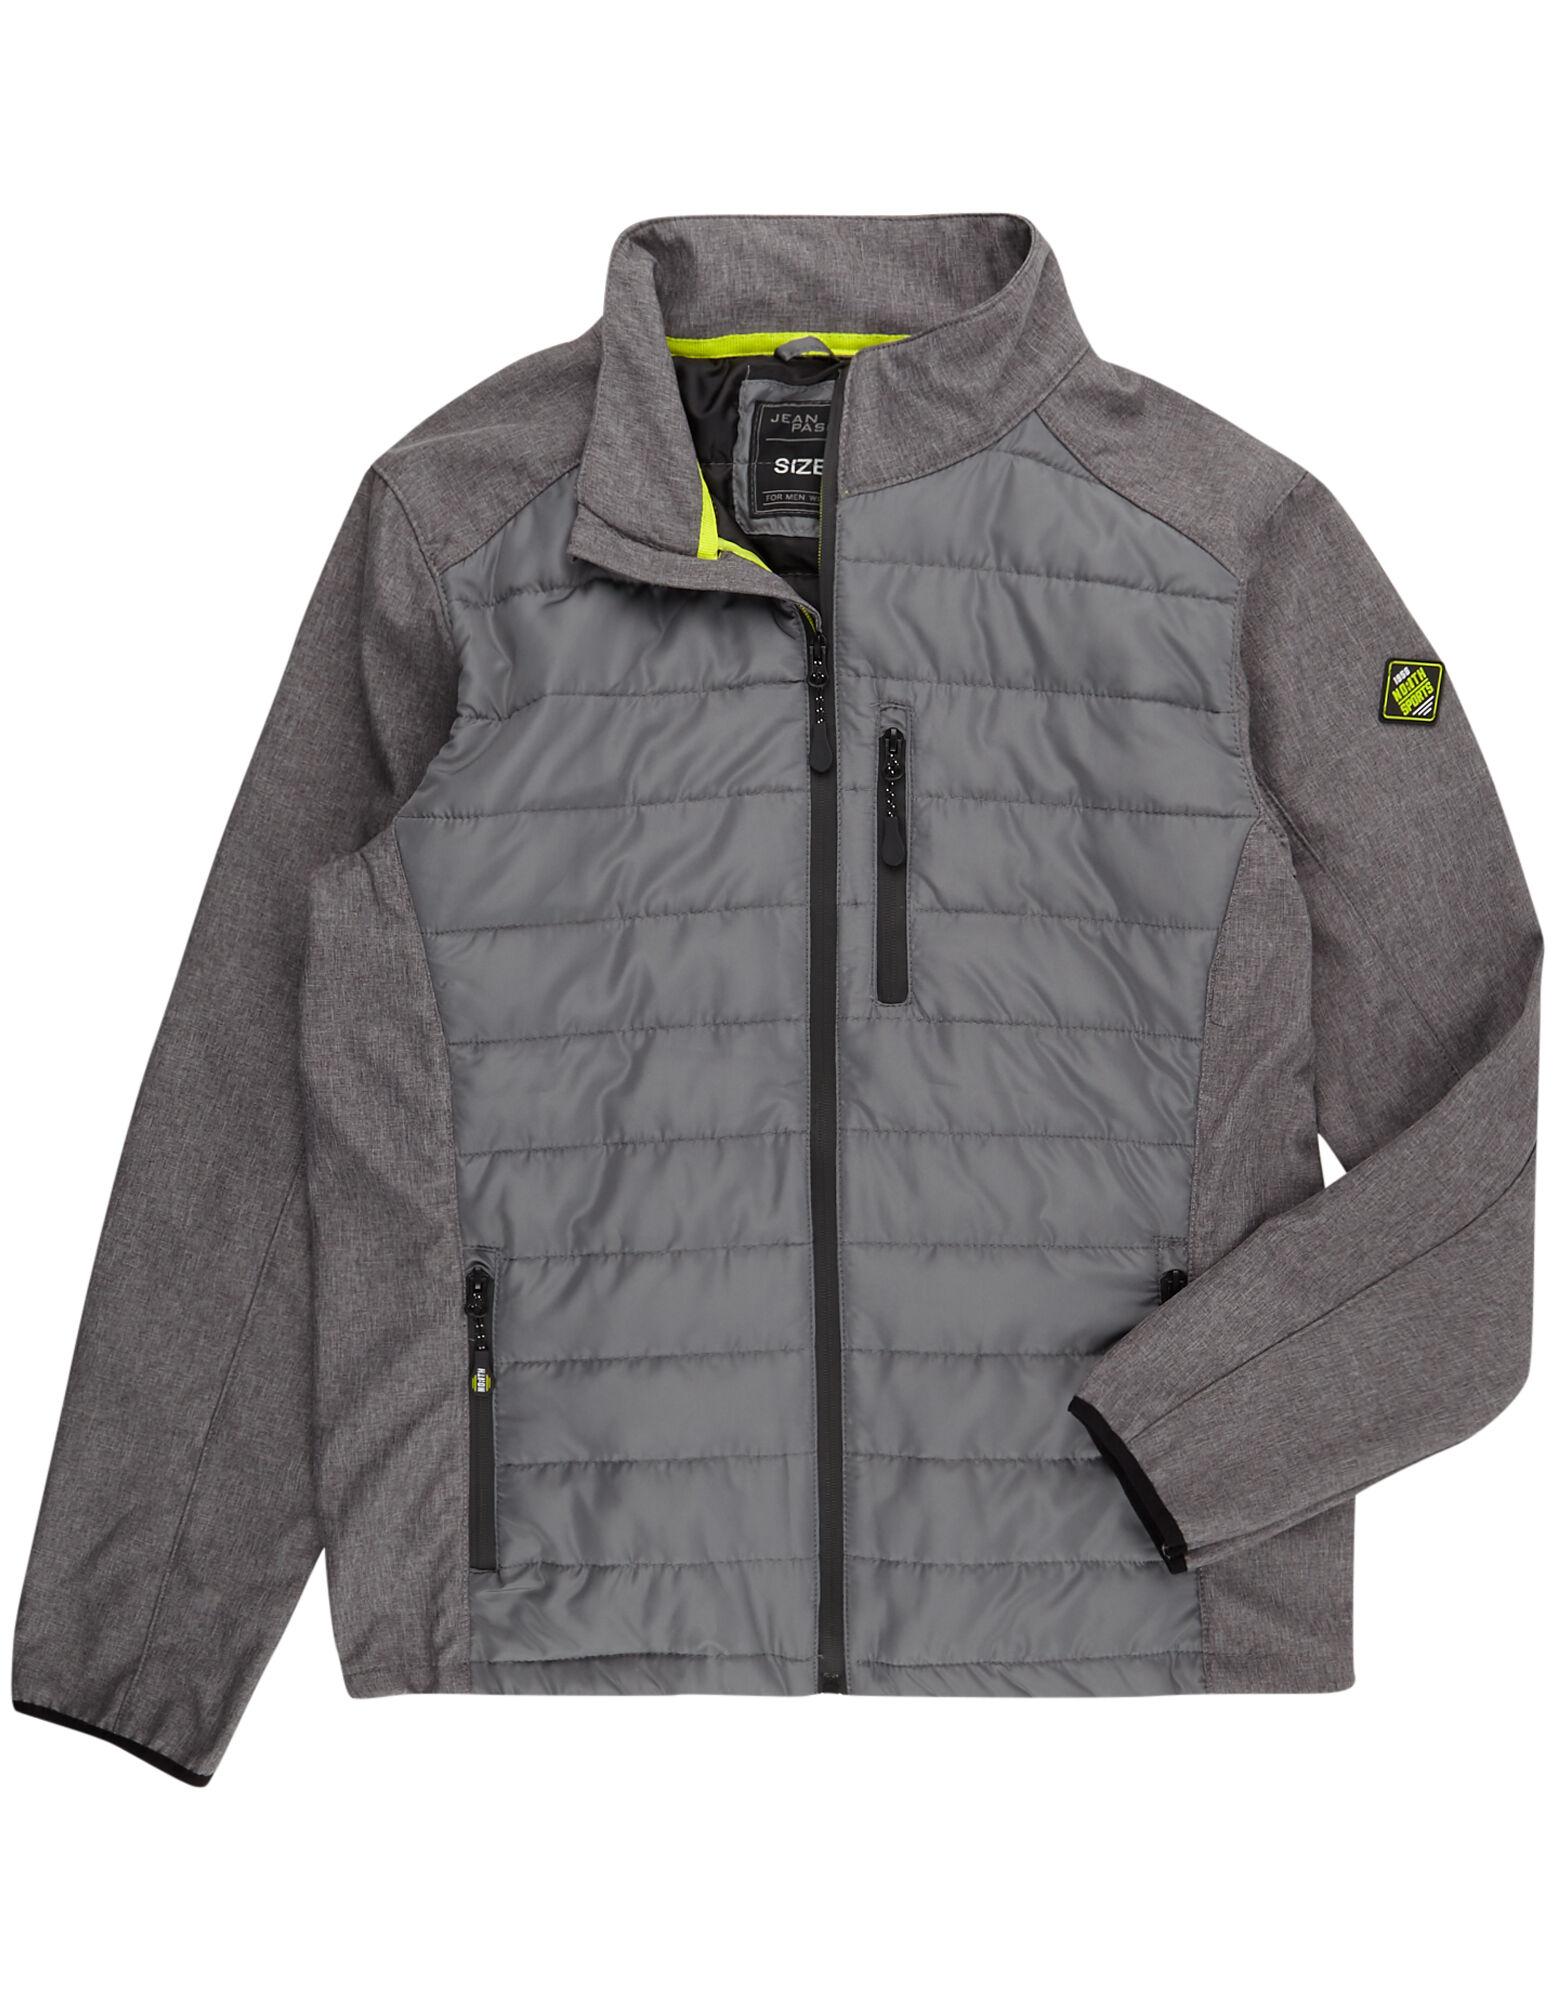 HERREN JUNGEN Übergangsjacke Softshell Jacke Kapuze Größe